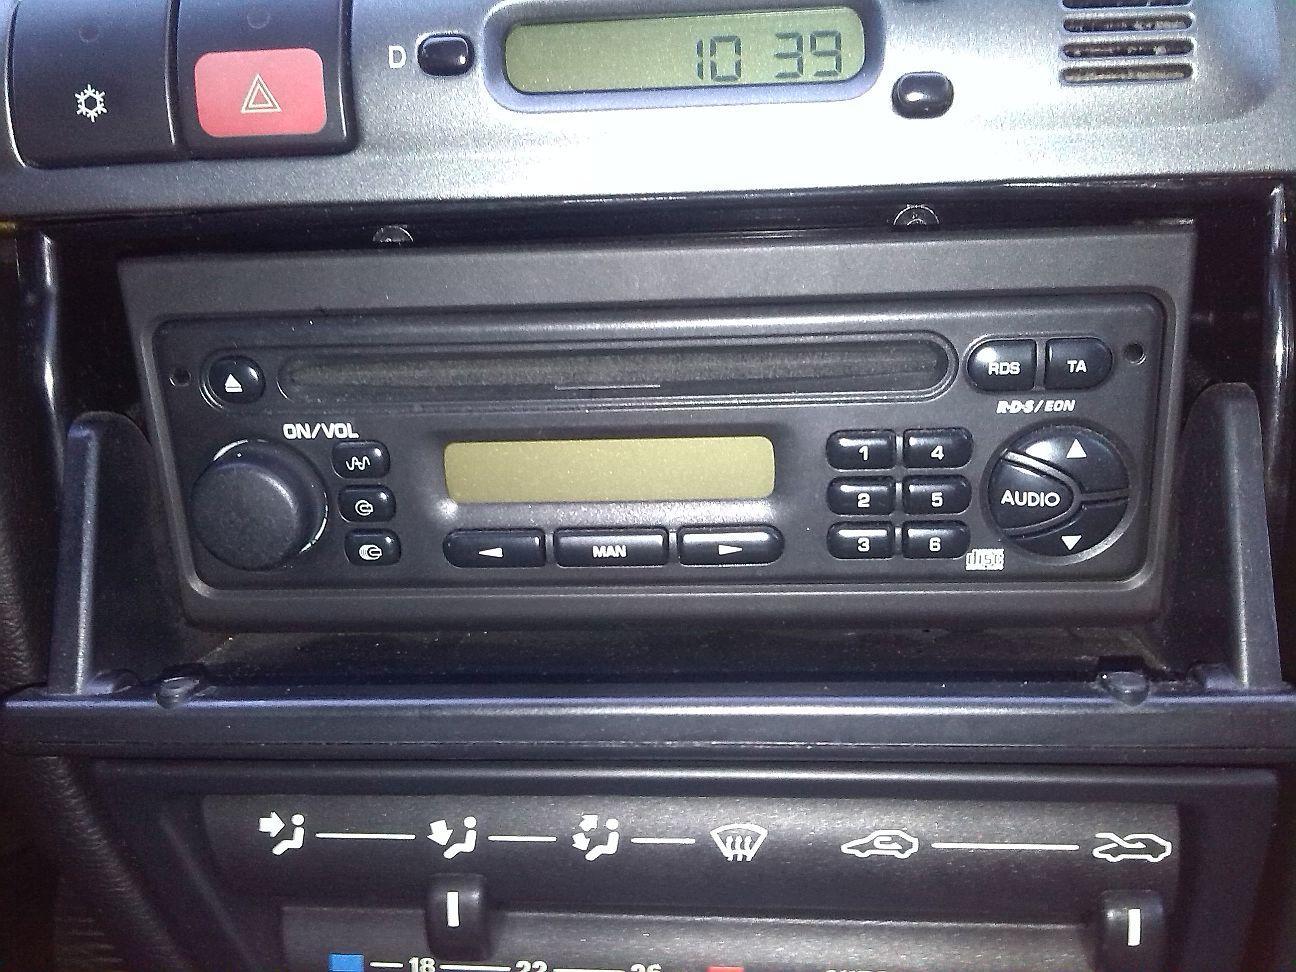 large.Radio.jpg.5089c0f75e49f736e08a4c543a713832.jpg